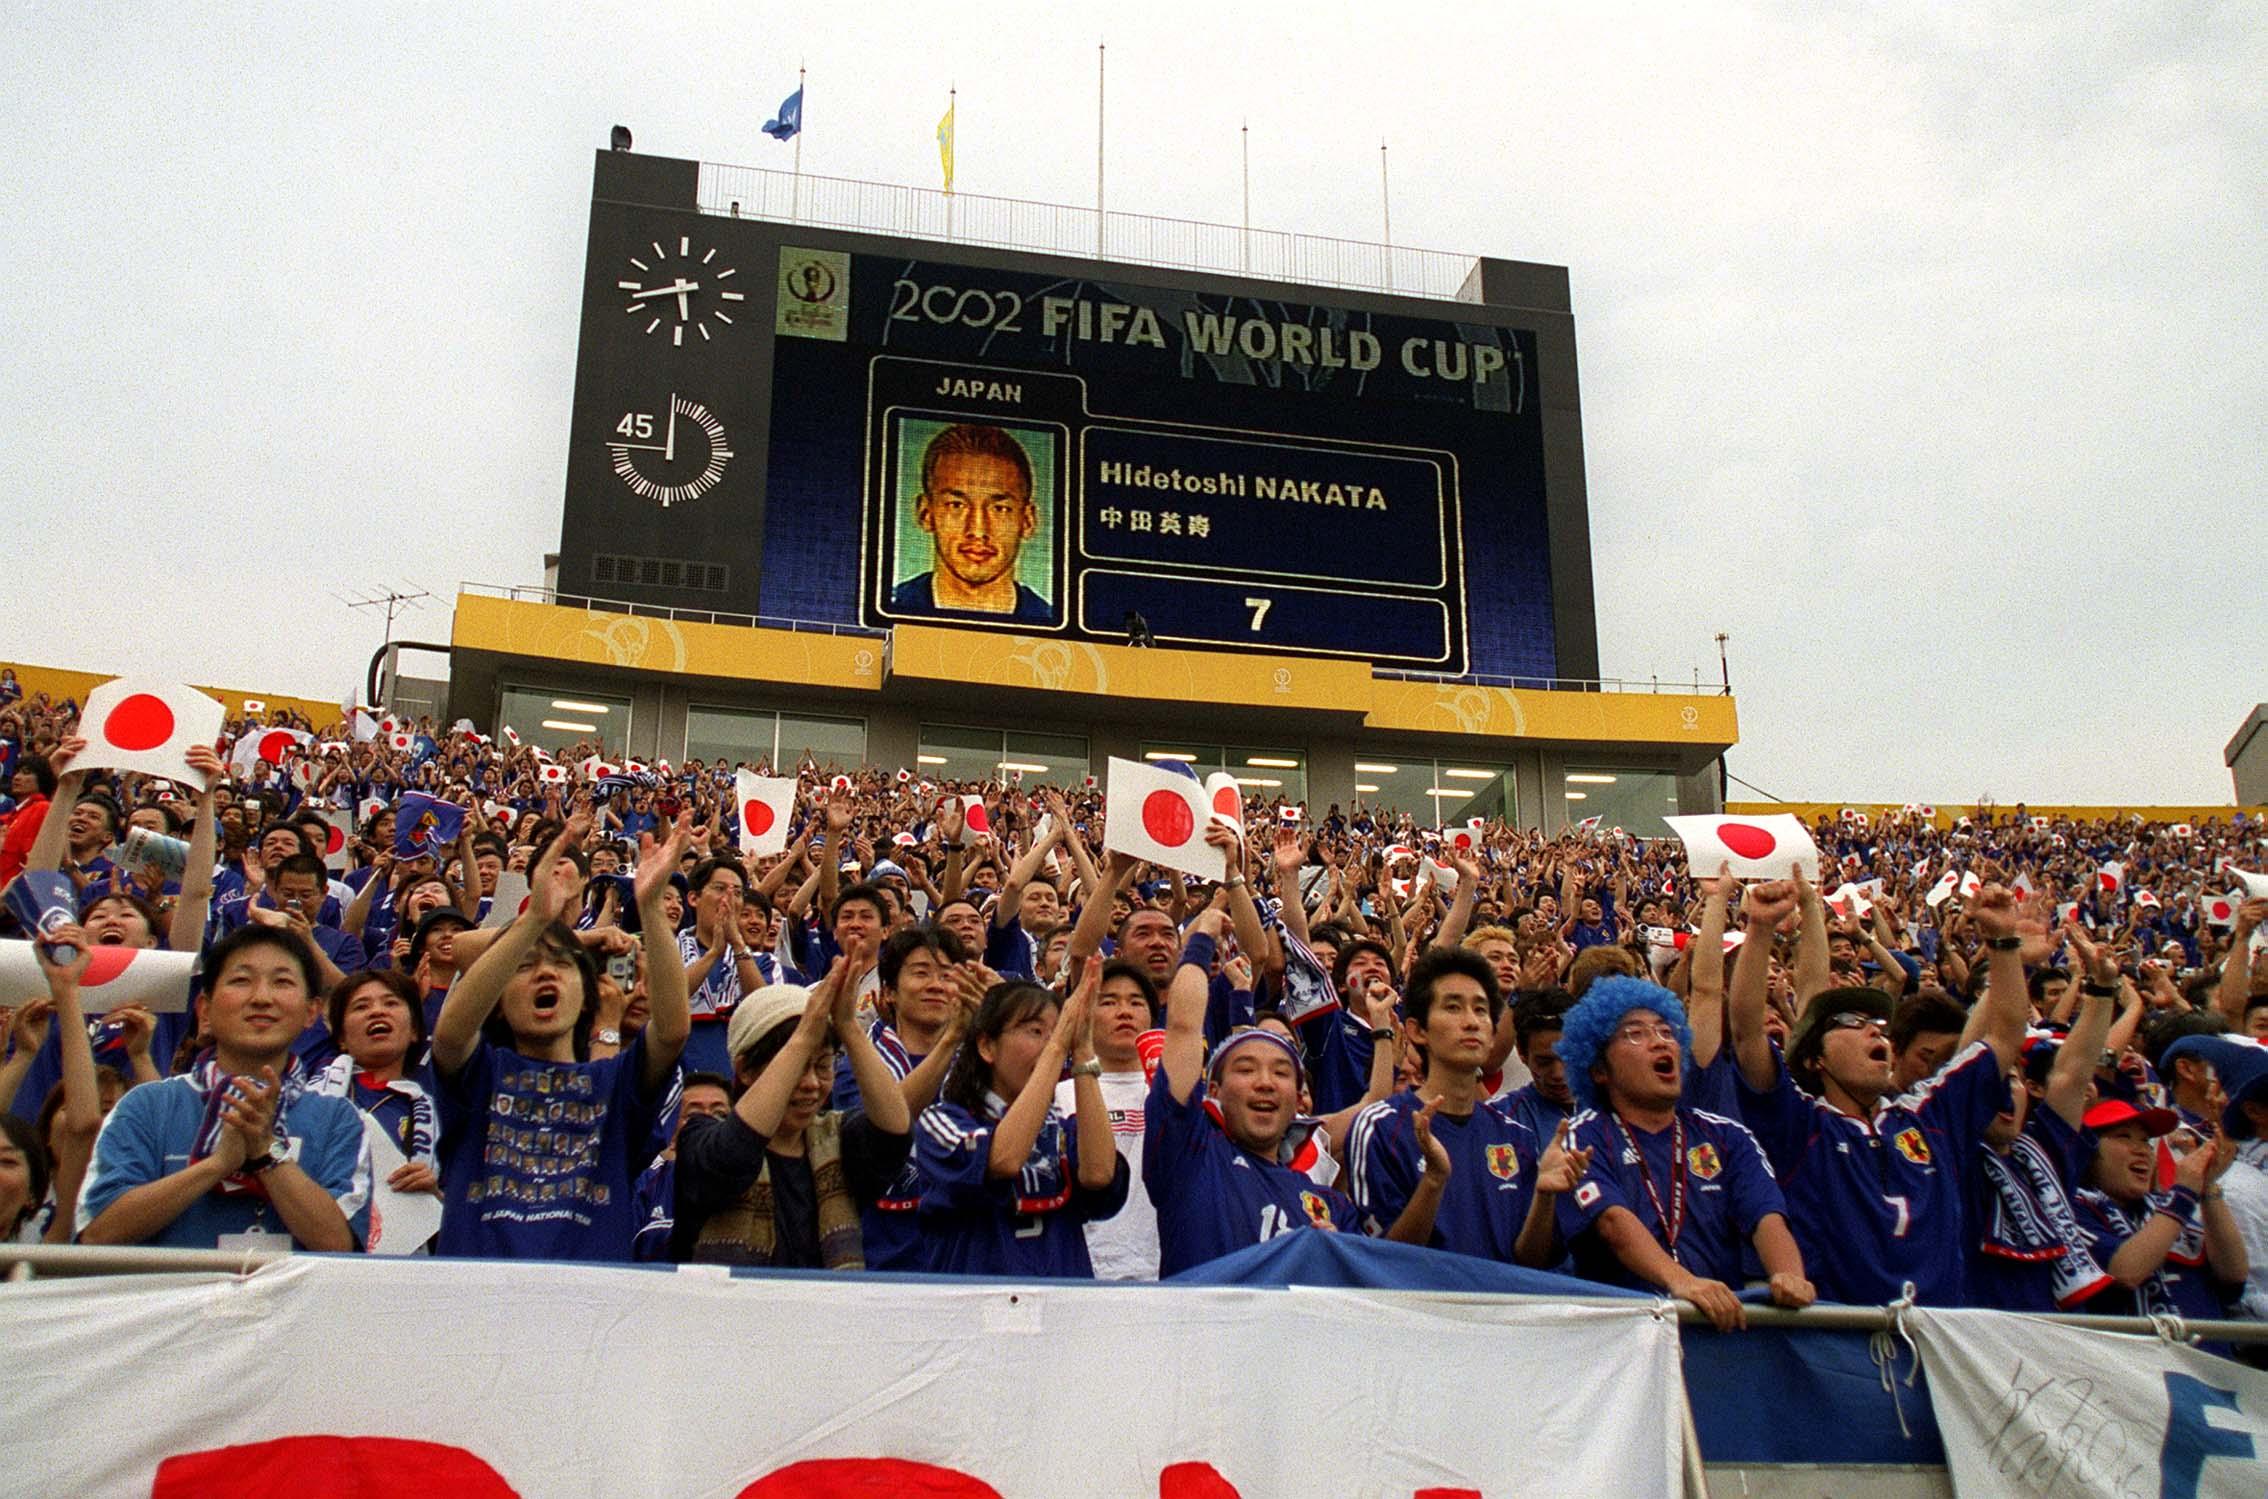 Stadium_Scoreboard_OFS.jpg